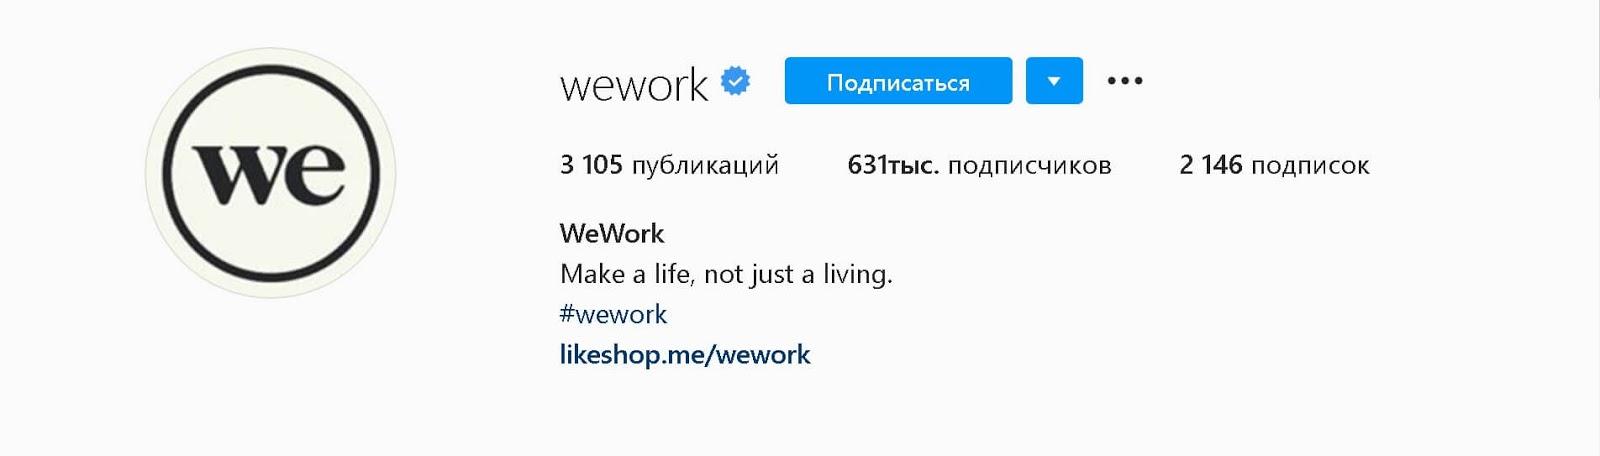 instagram-bios-wework